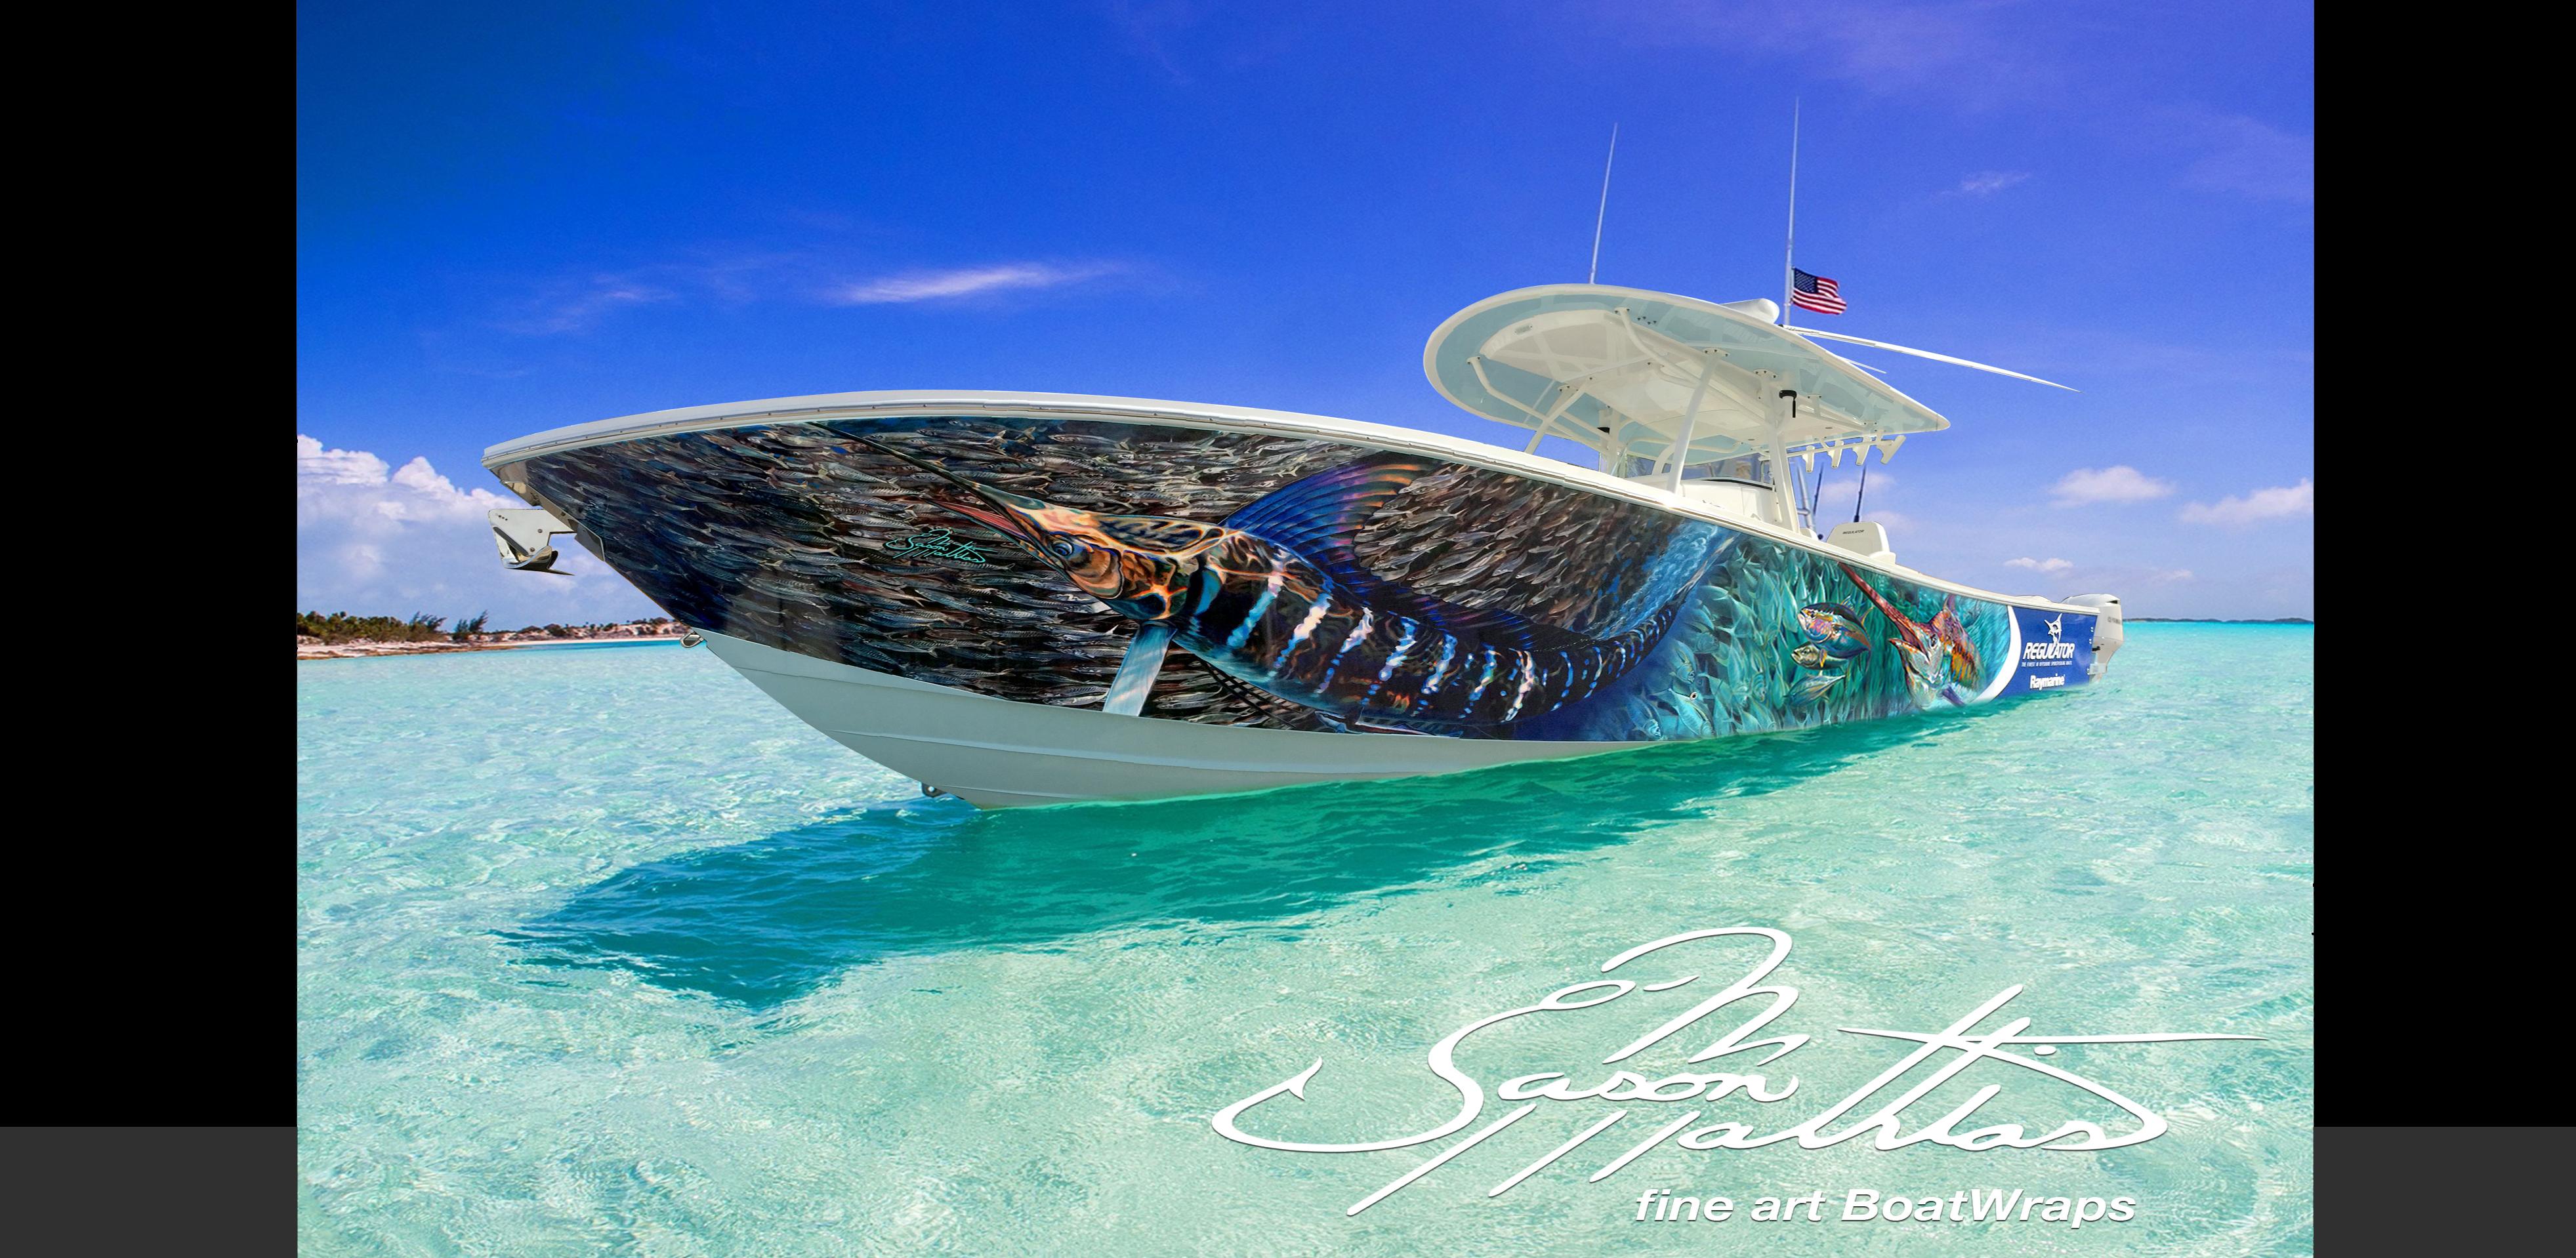 boat wraps art designs ideas concepts gamefish fis